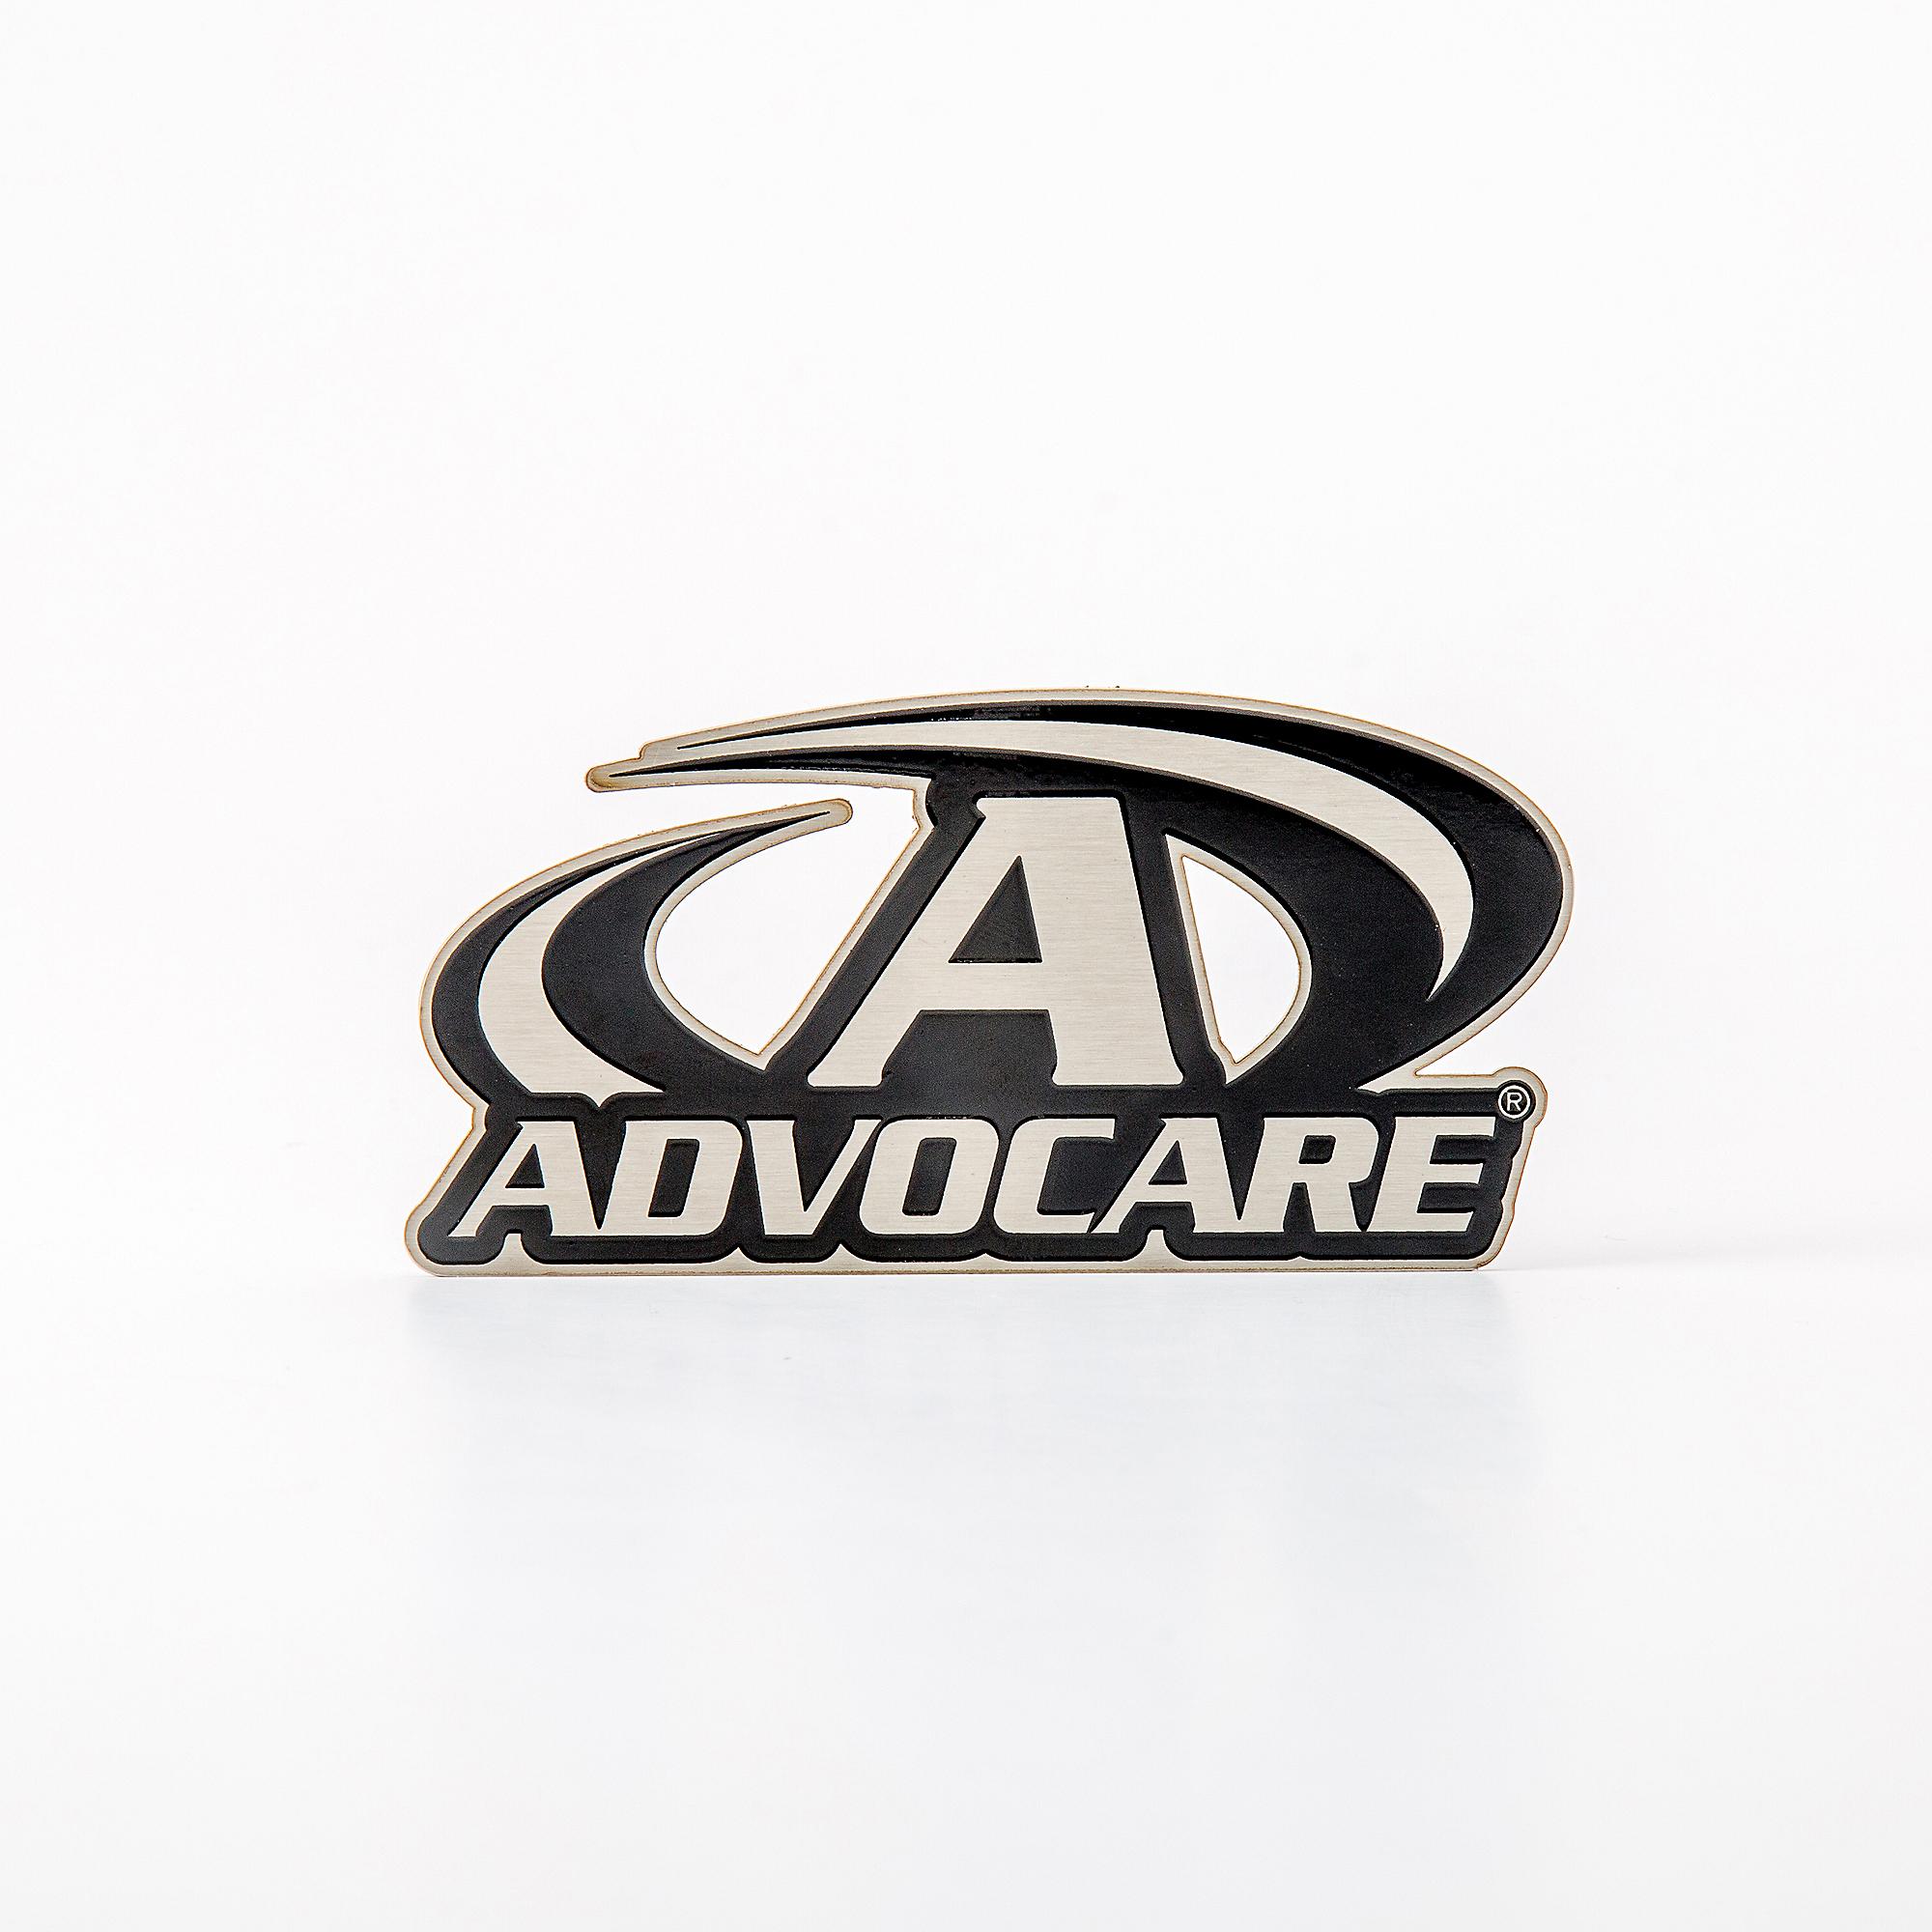 AdvoCare Auto Emblem